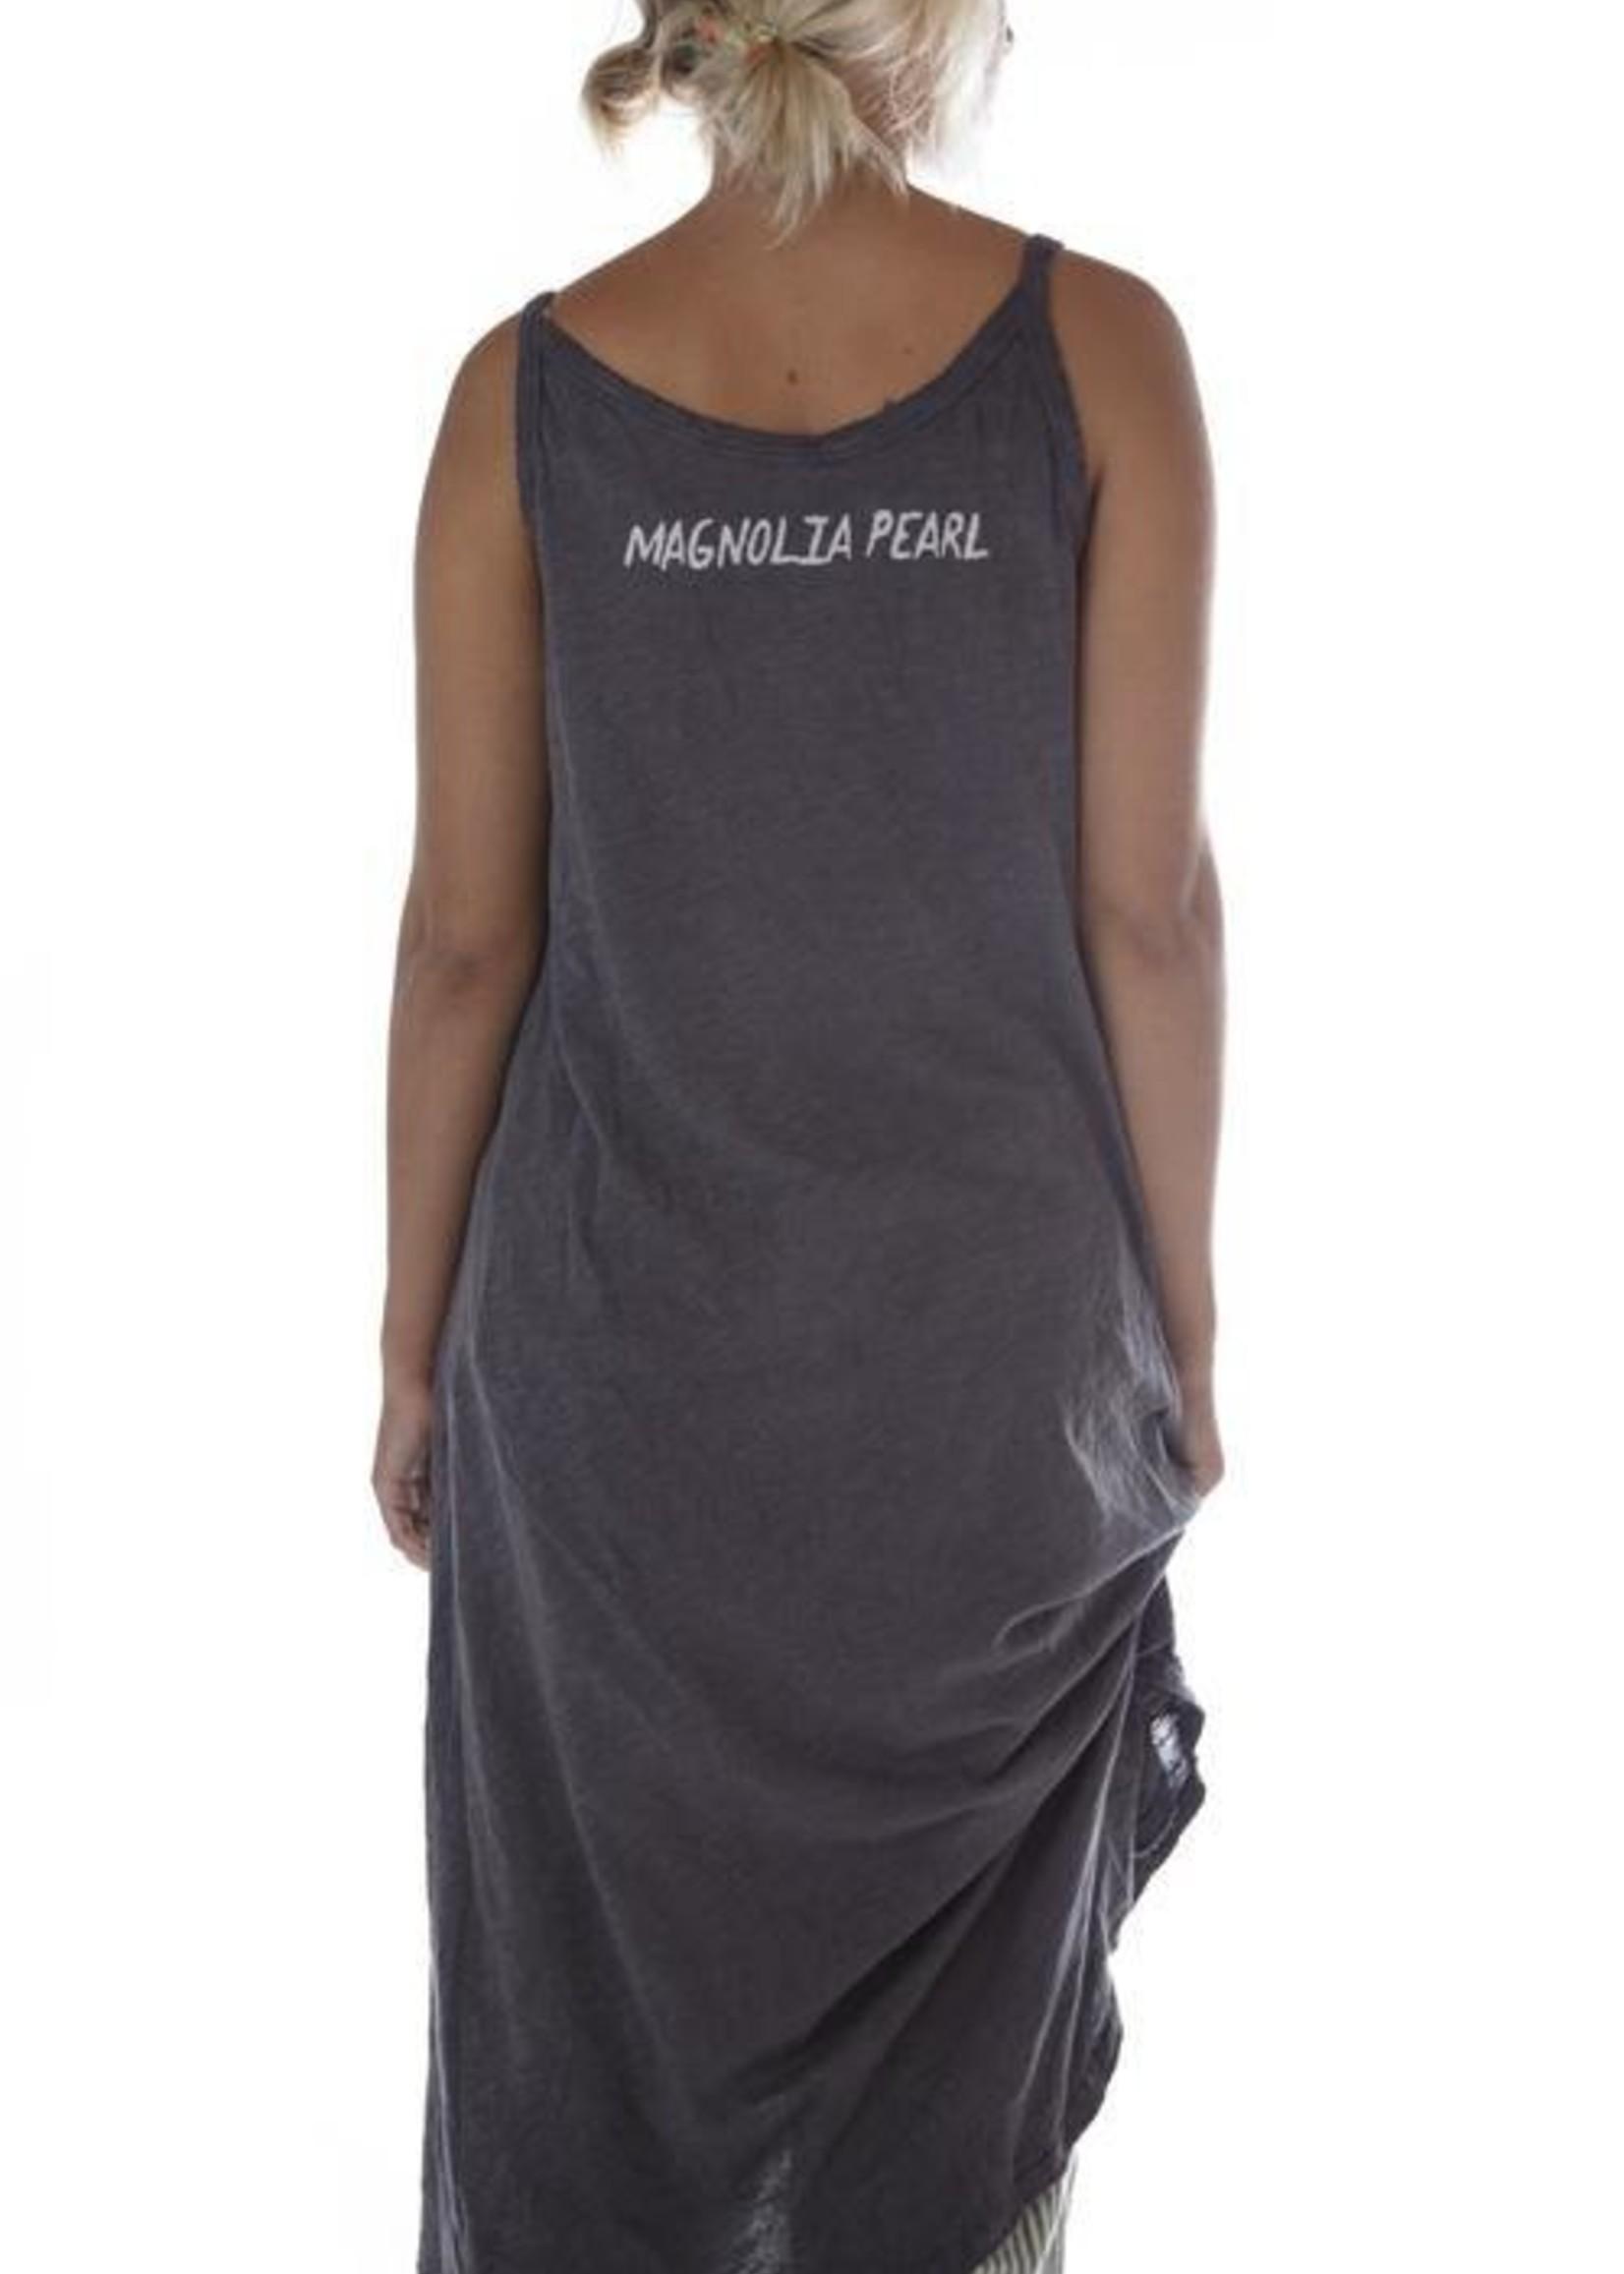 Magnolia Pearl Lana Tank Dress - Ozzy